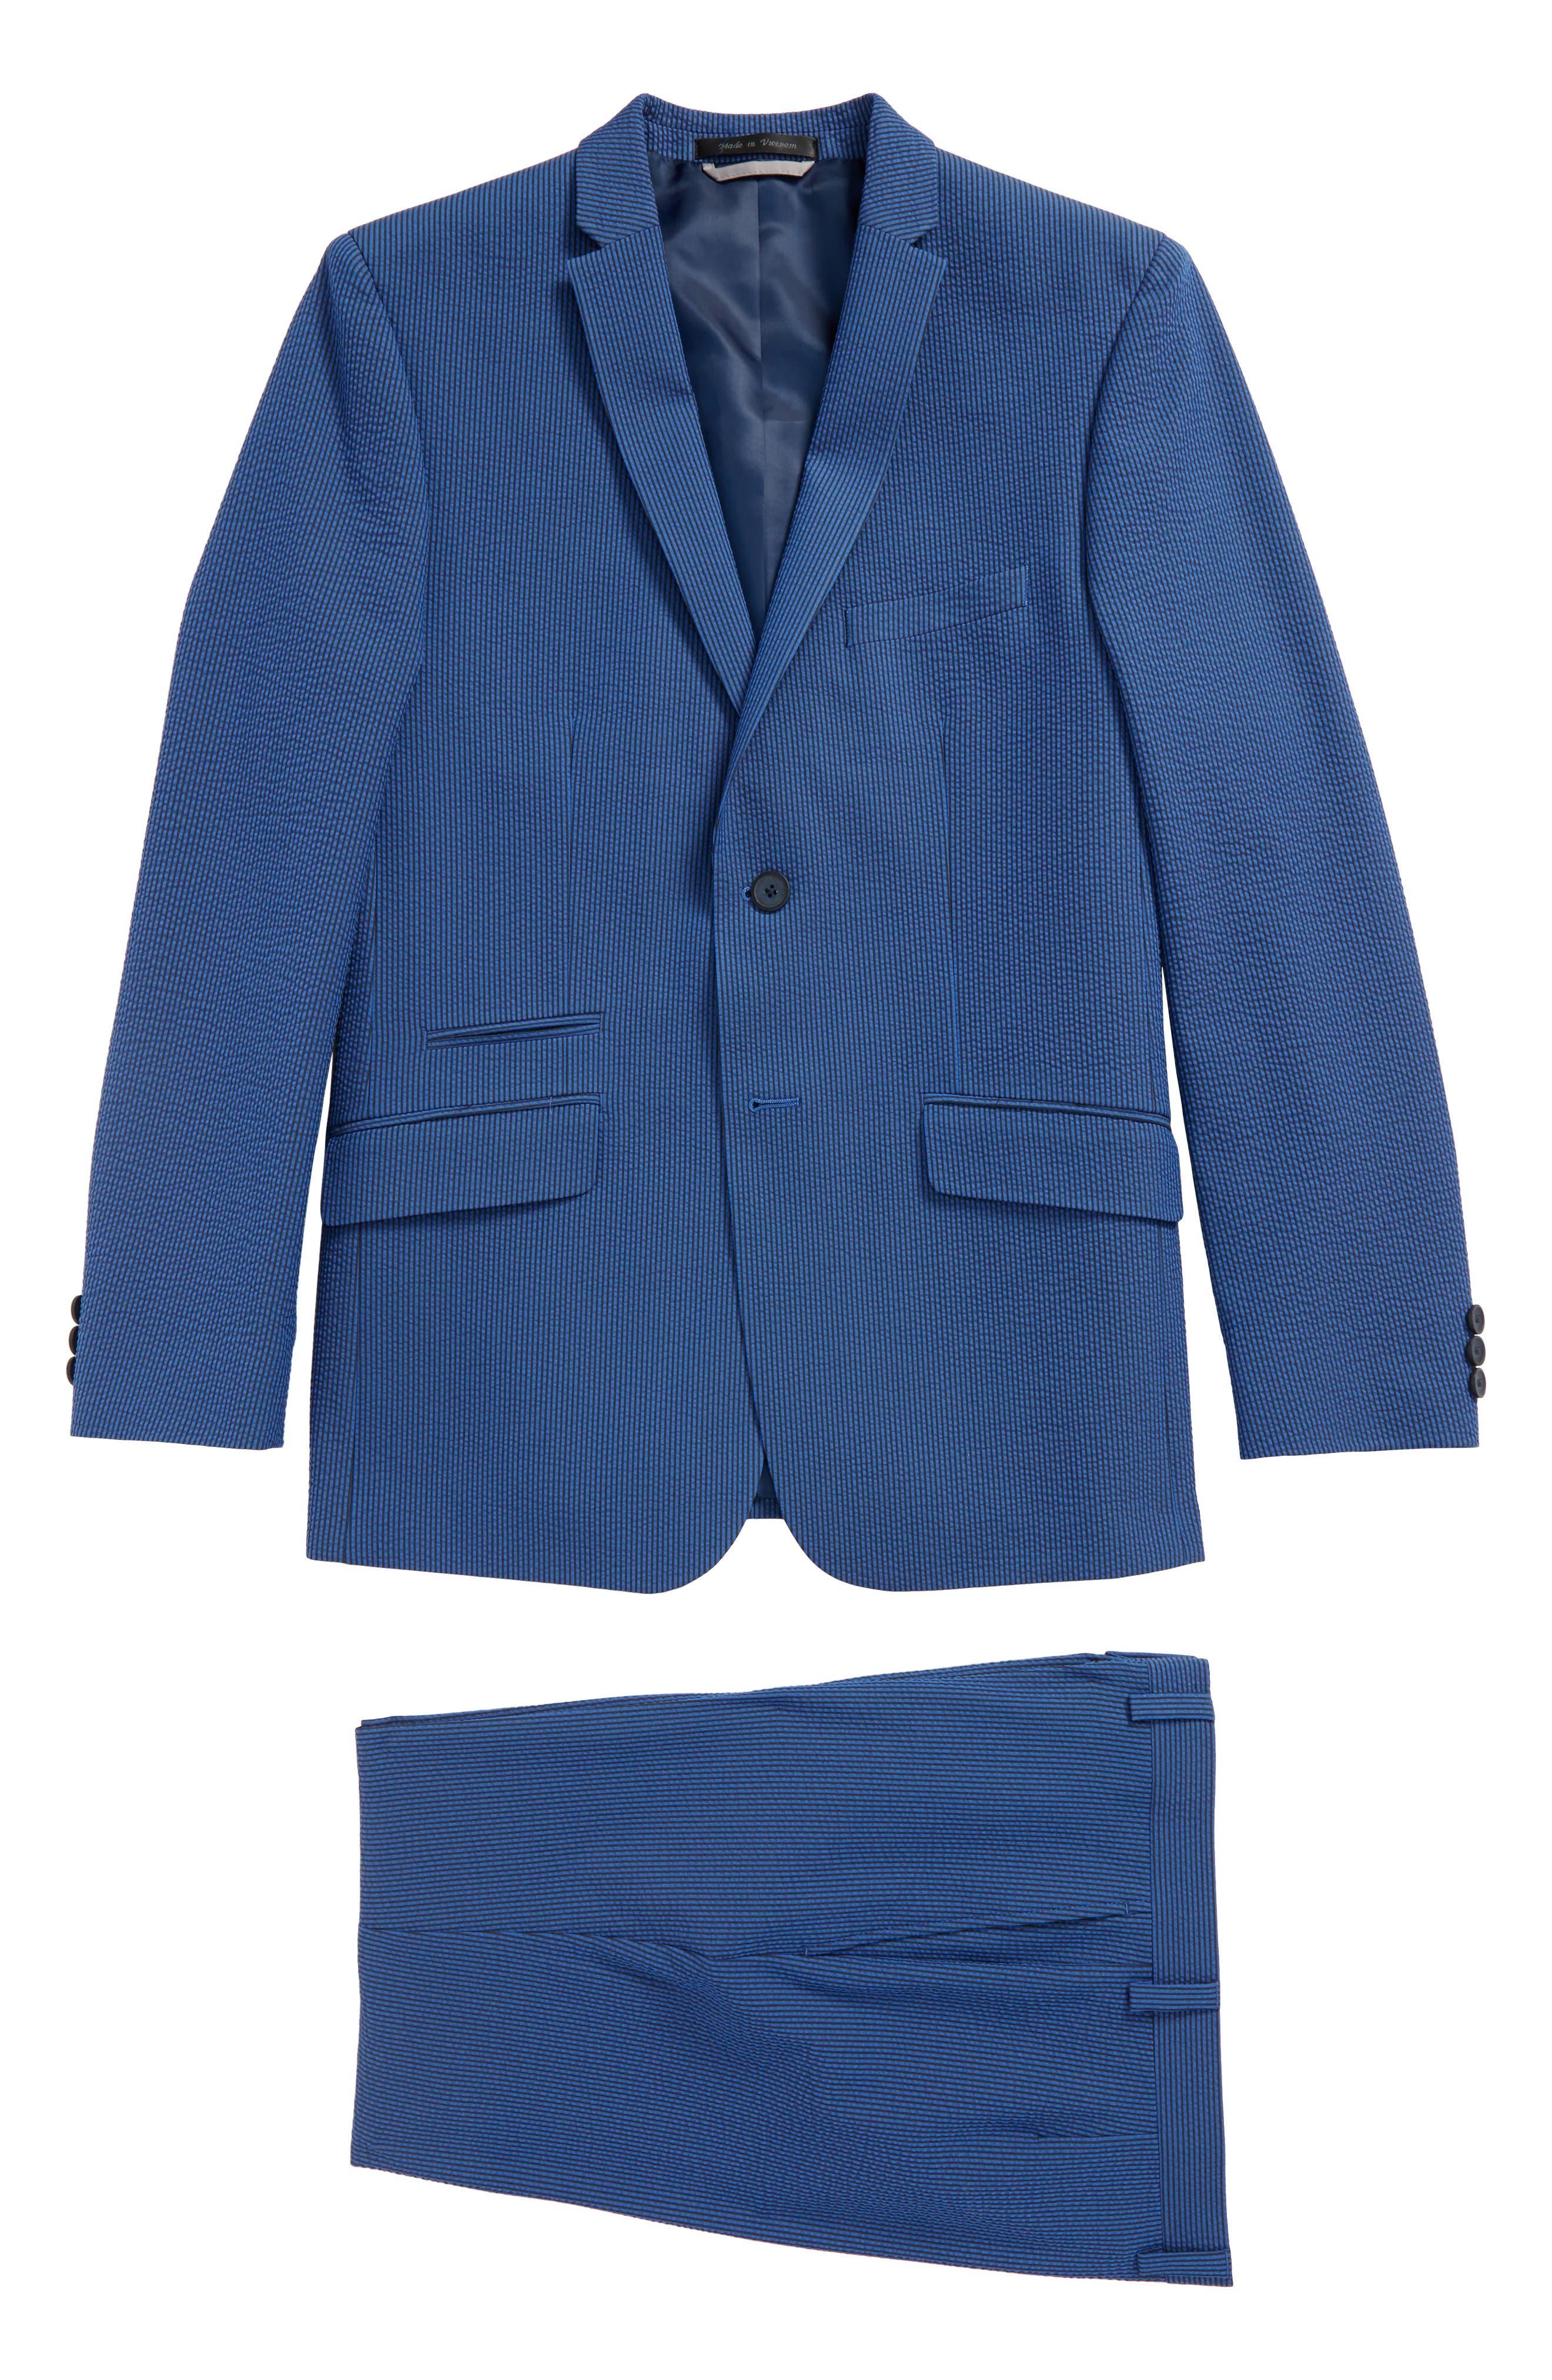 Skinny Fit Suit,                             Main thumbnail 1, color,                             Medium Blue